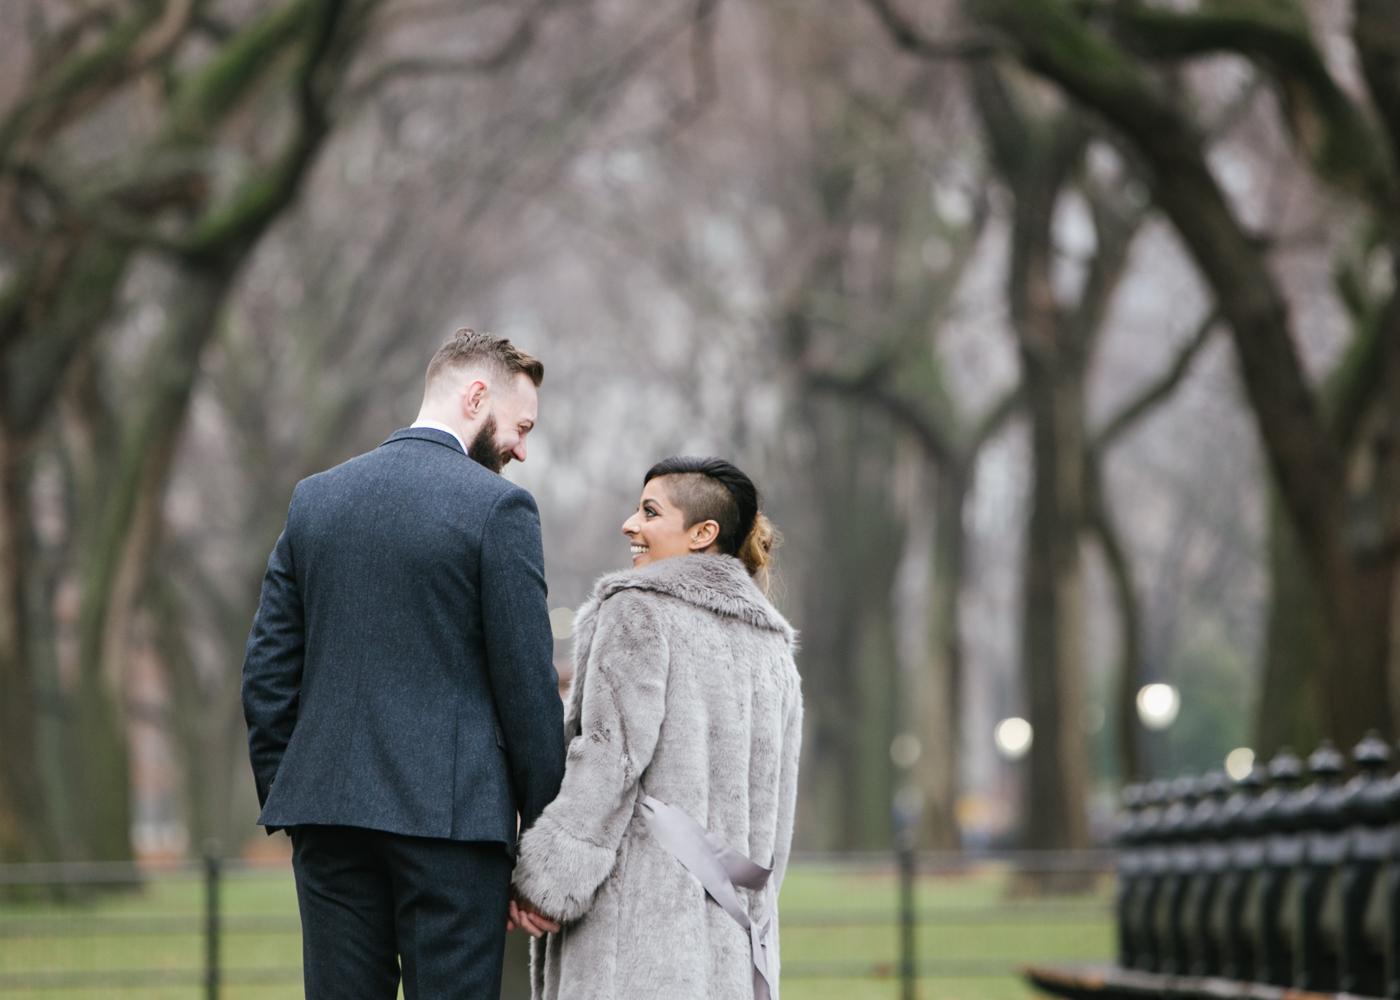 Central-park-wedding-by-Tanya-Isaeva-105.jpg